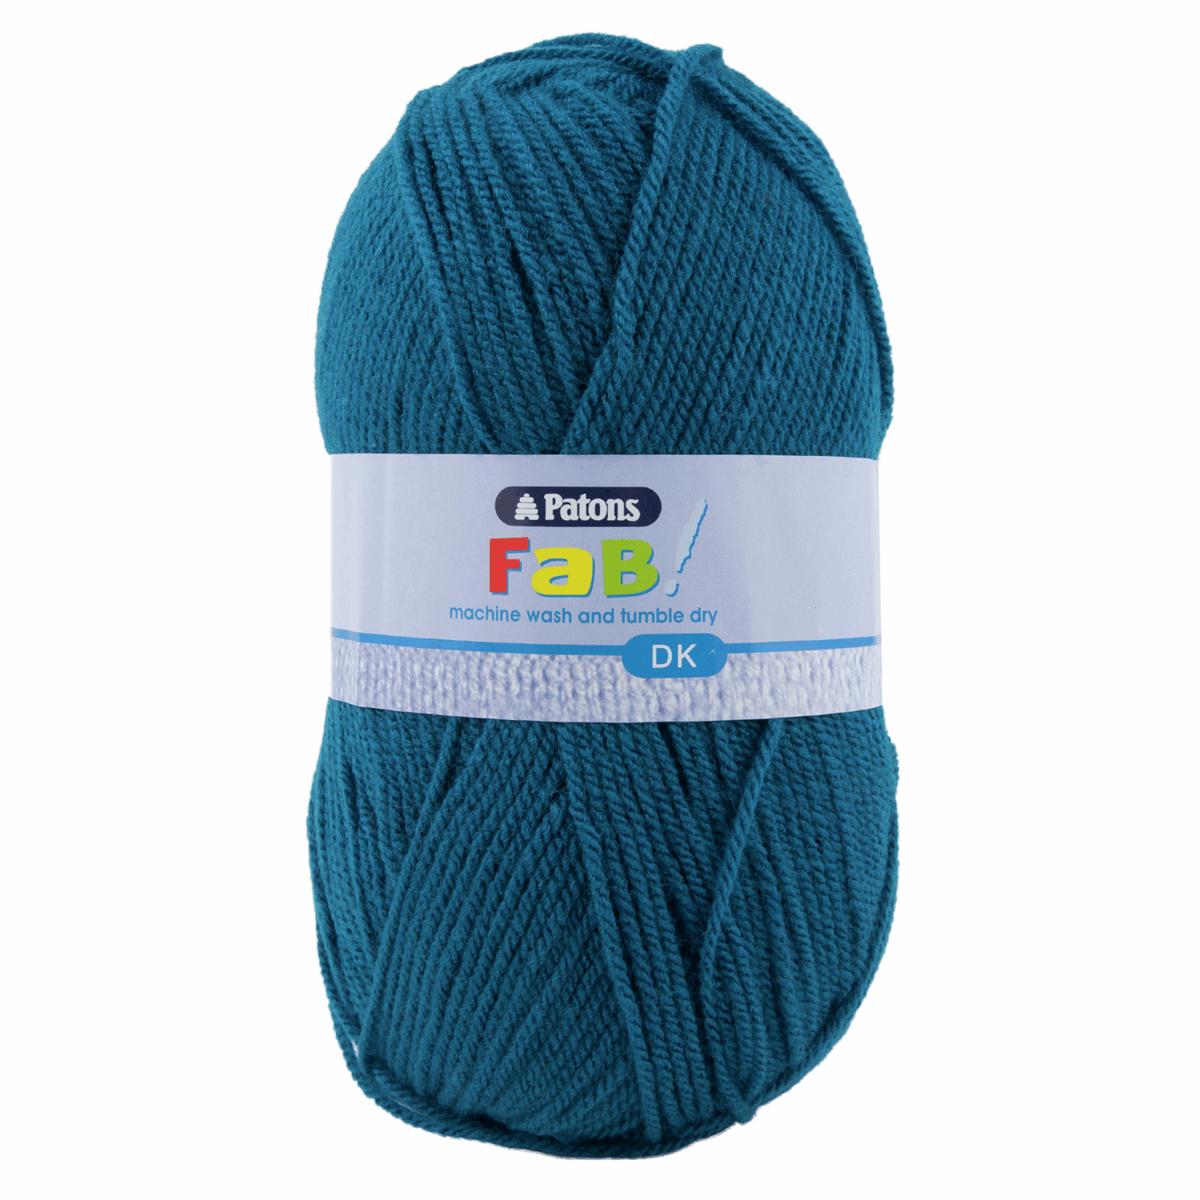 Patons Fab Double Knit 100g - Various Colours - HaberDasherDo